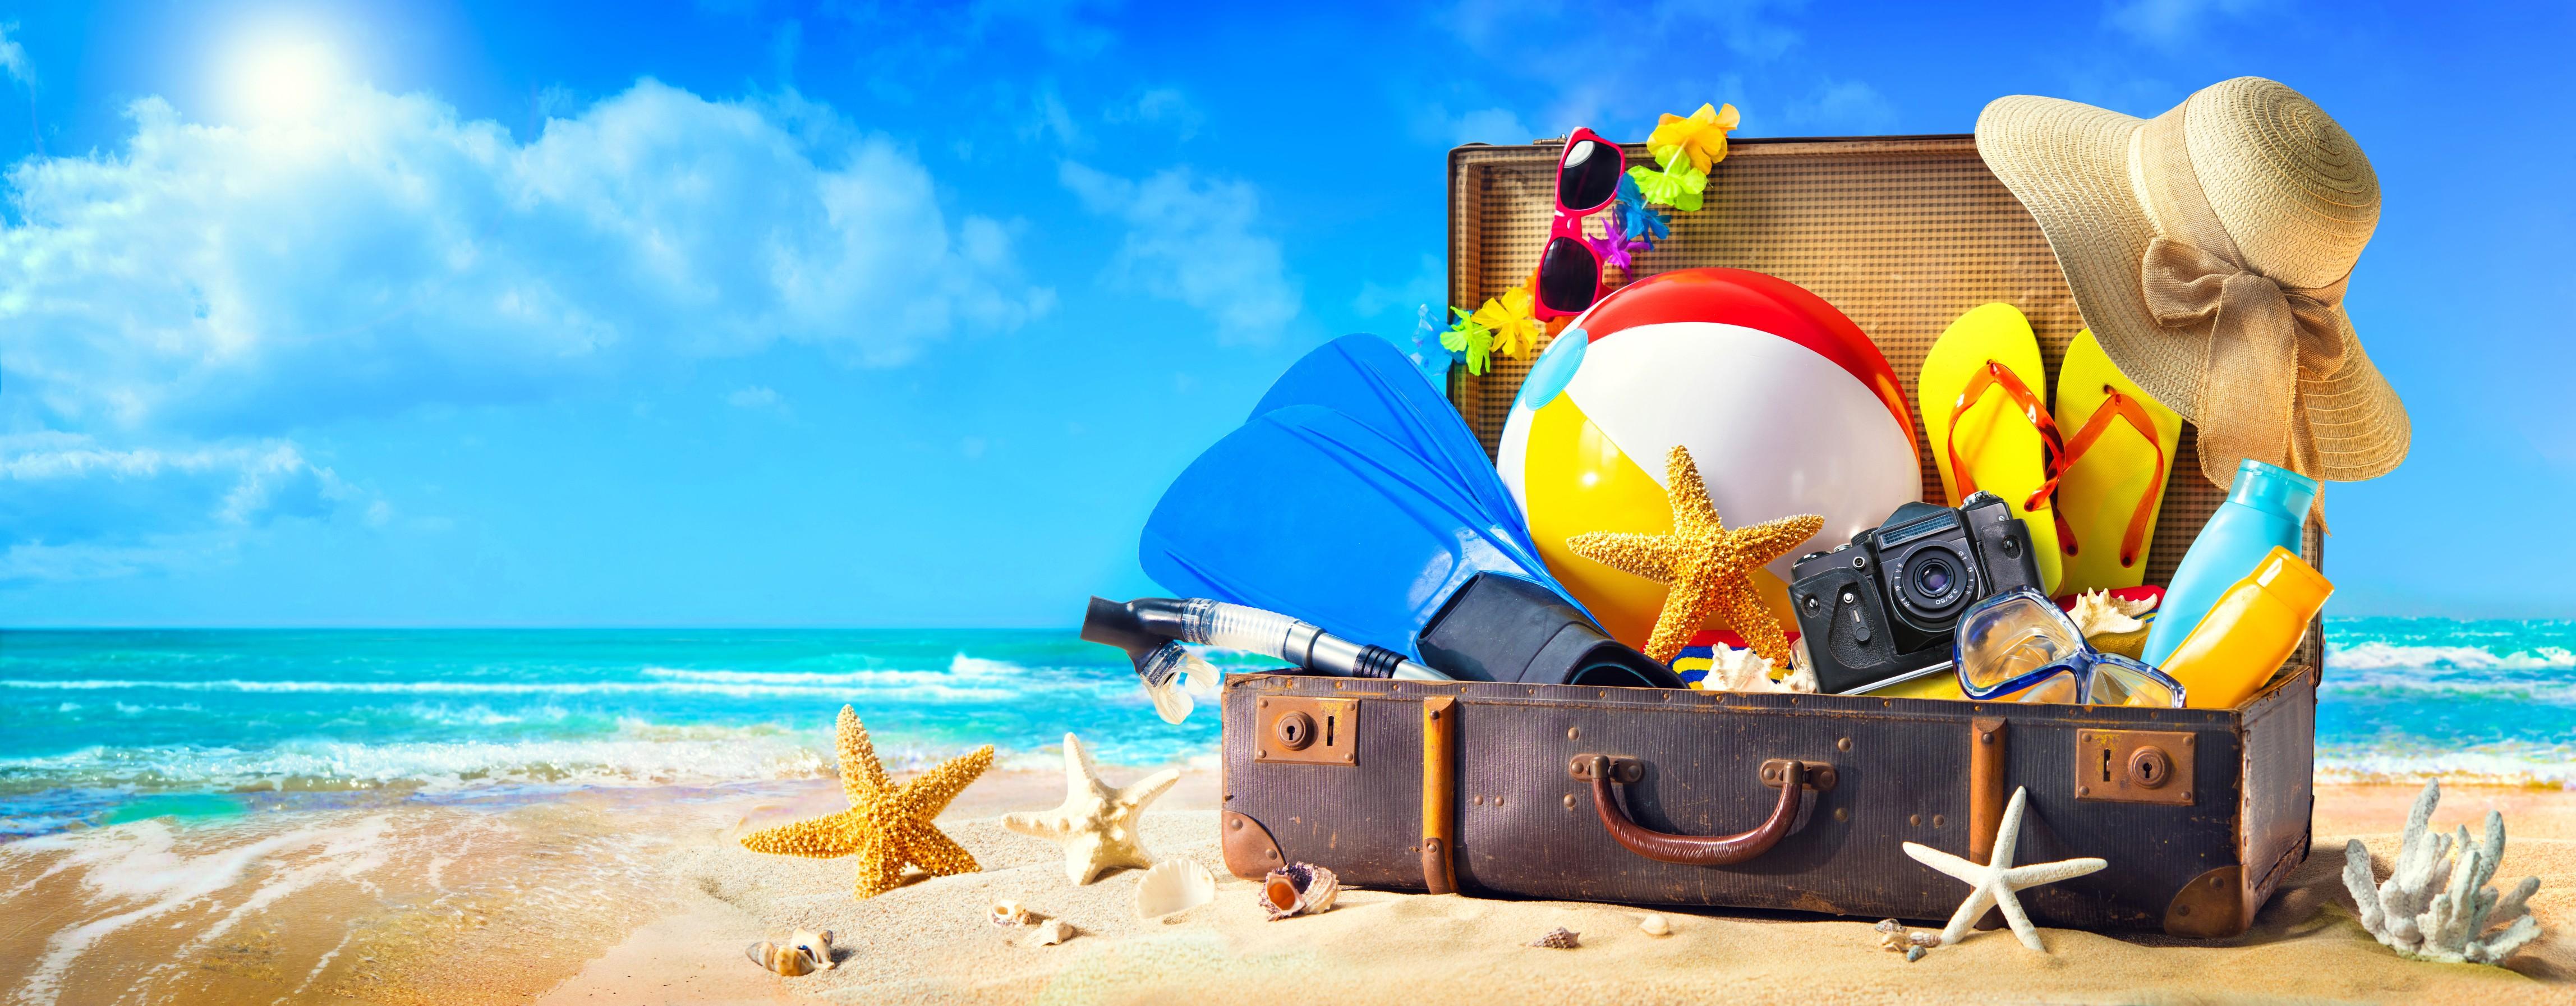 Aide aux vacances.jpg